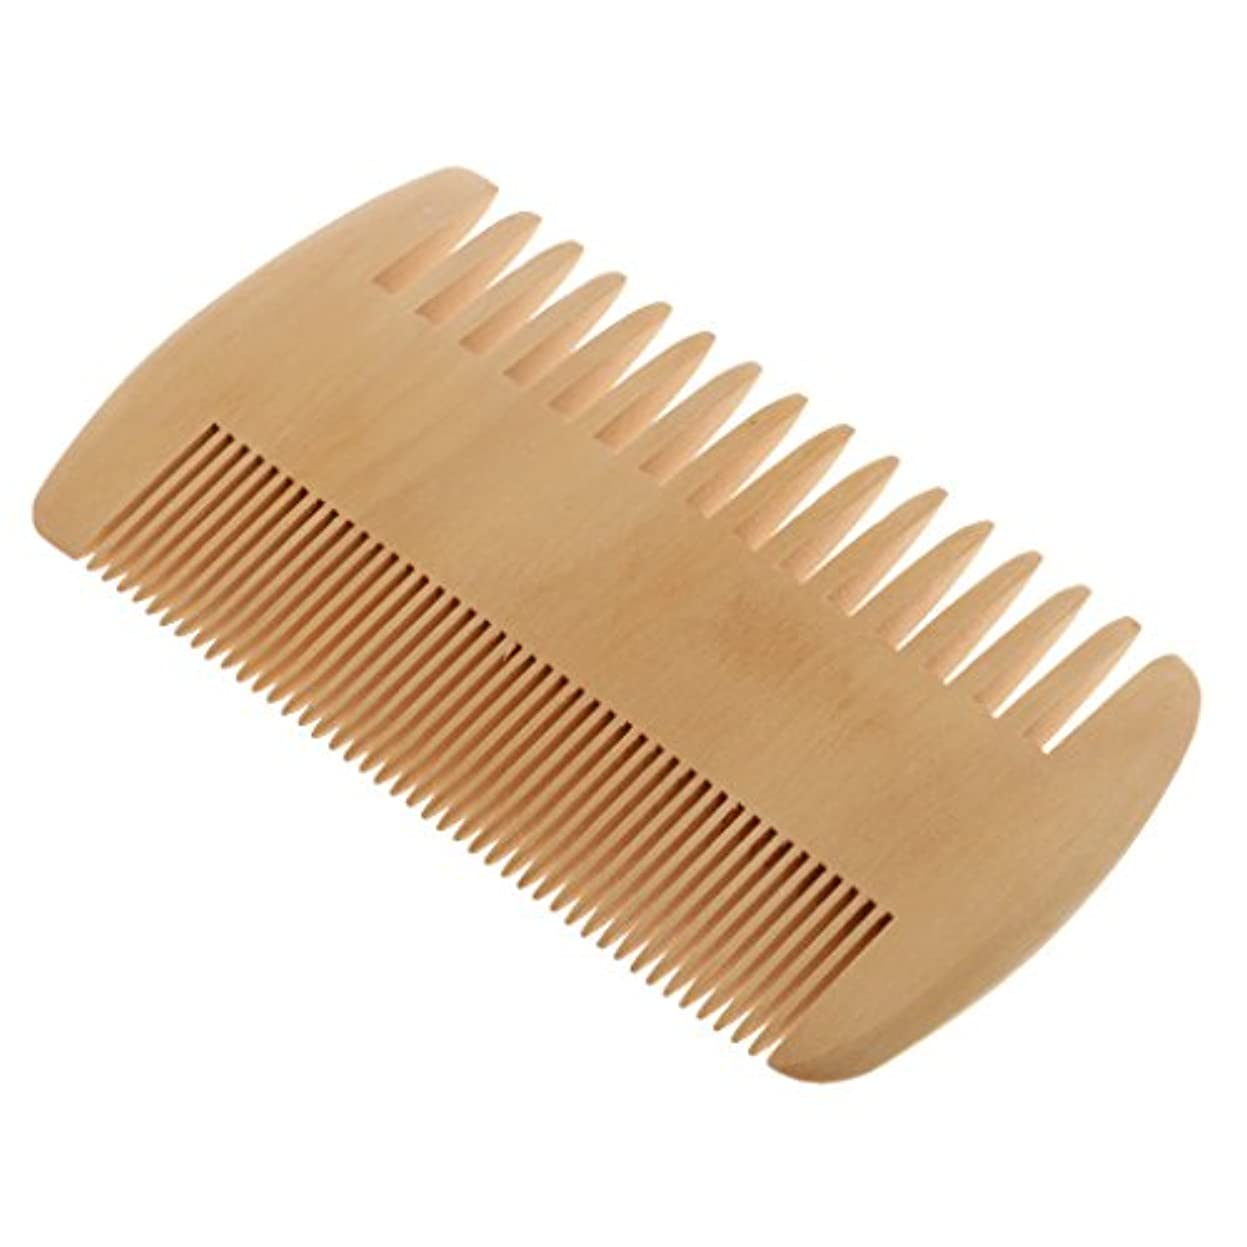 CUTICATE 木製コーム 木製櫛 ヘアブラシ 帯電防止櫛 ポケットコーム ヘアスタイリング 用品